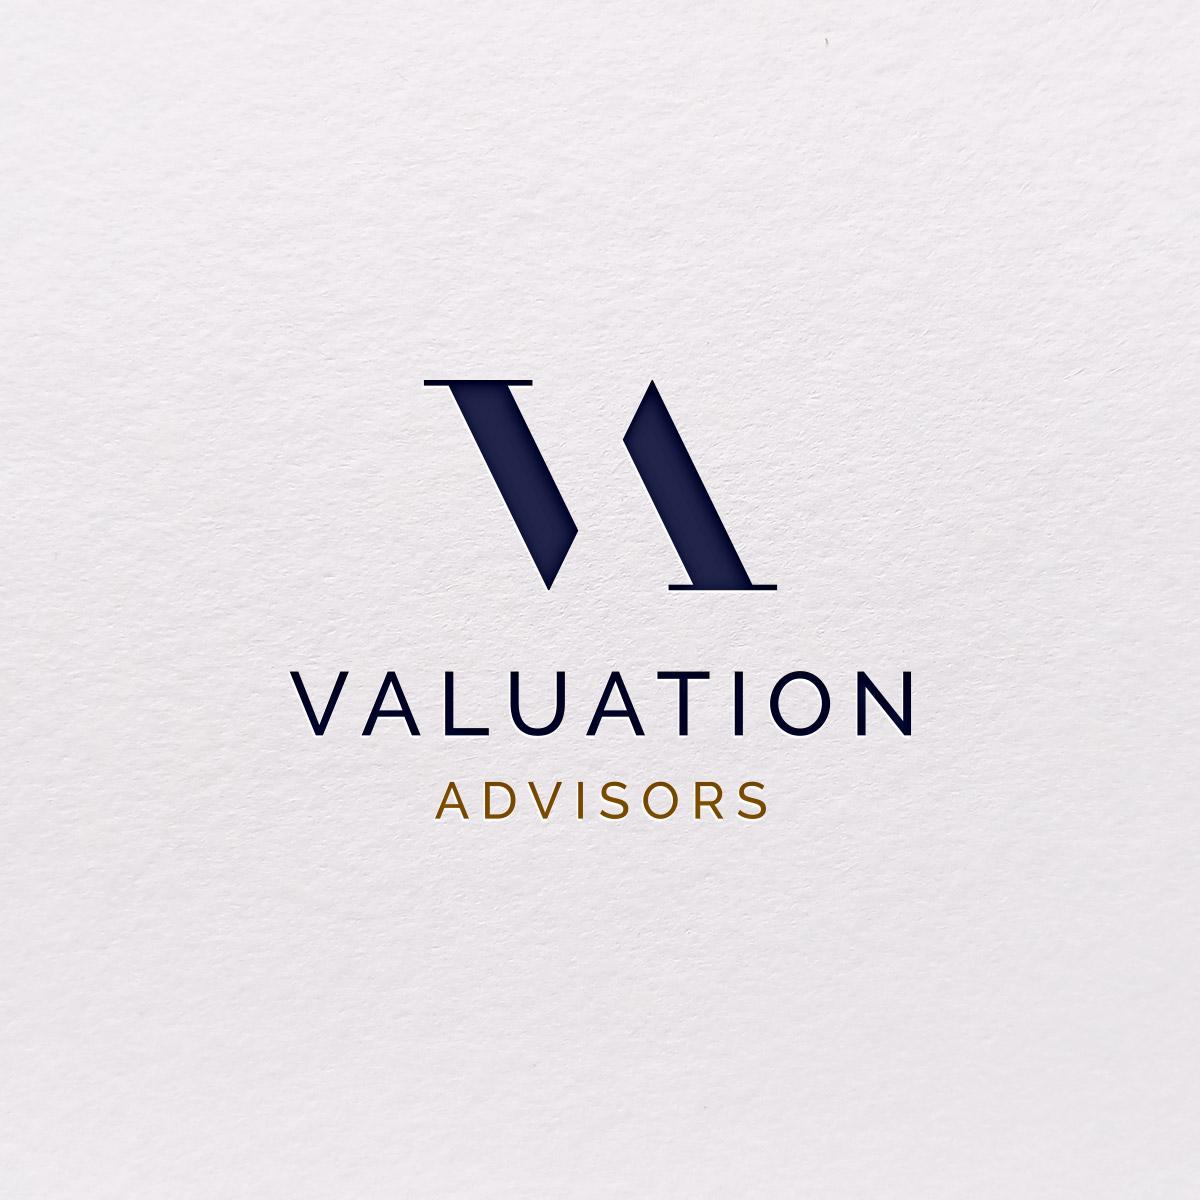 Projeto de Branding Valuation Advisors